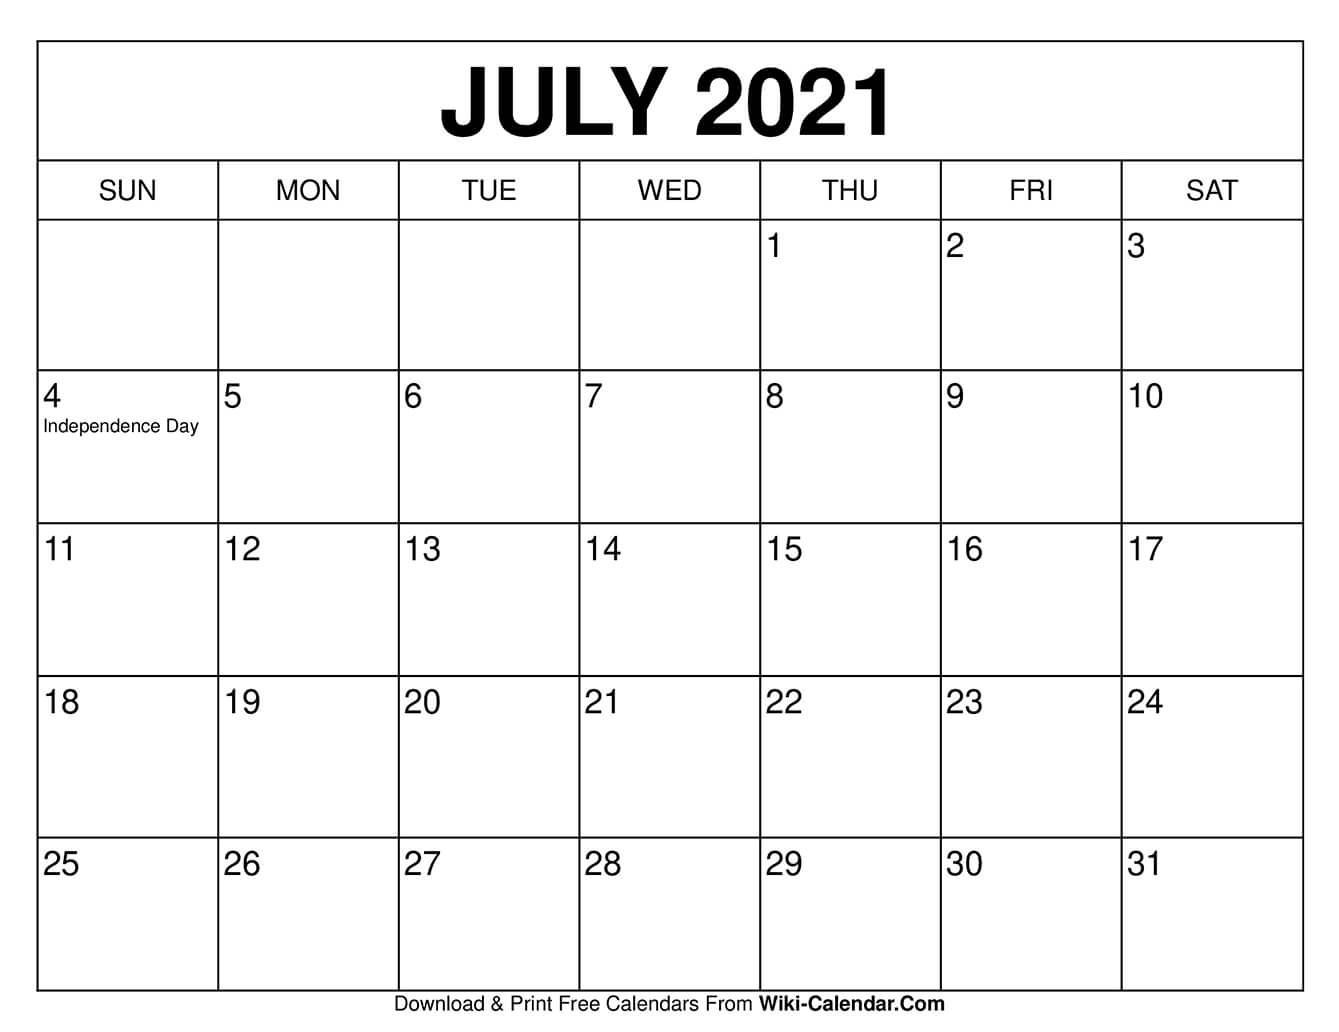 2021 blank monthly calendar pagespdf format. July 2021 Calendar Wallpapers - Wallpaper Cave